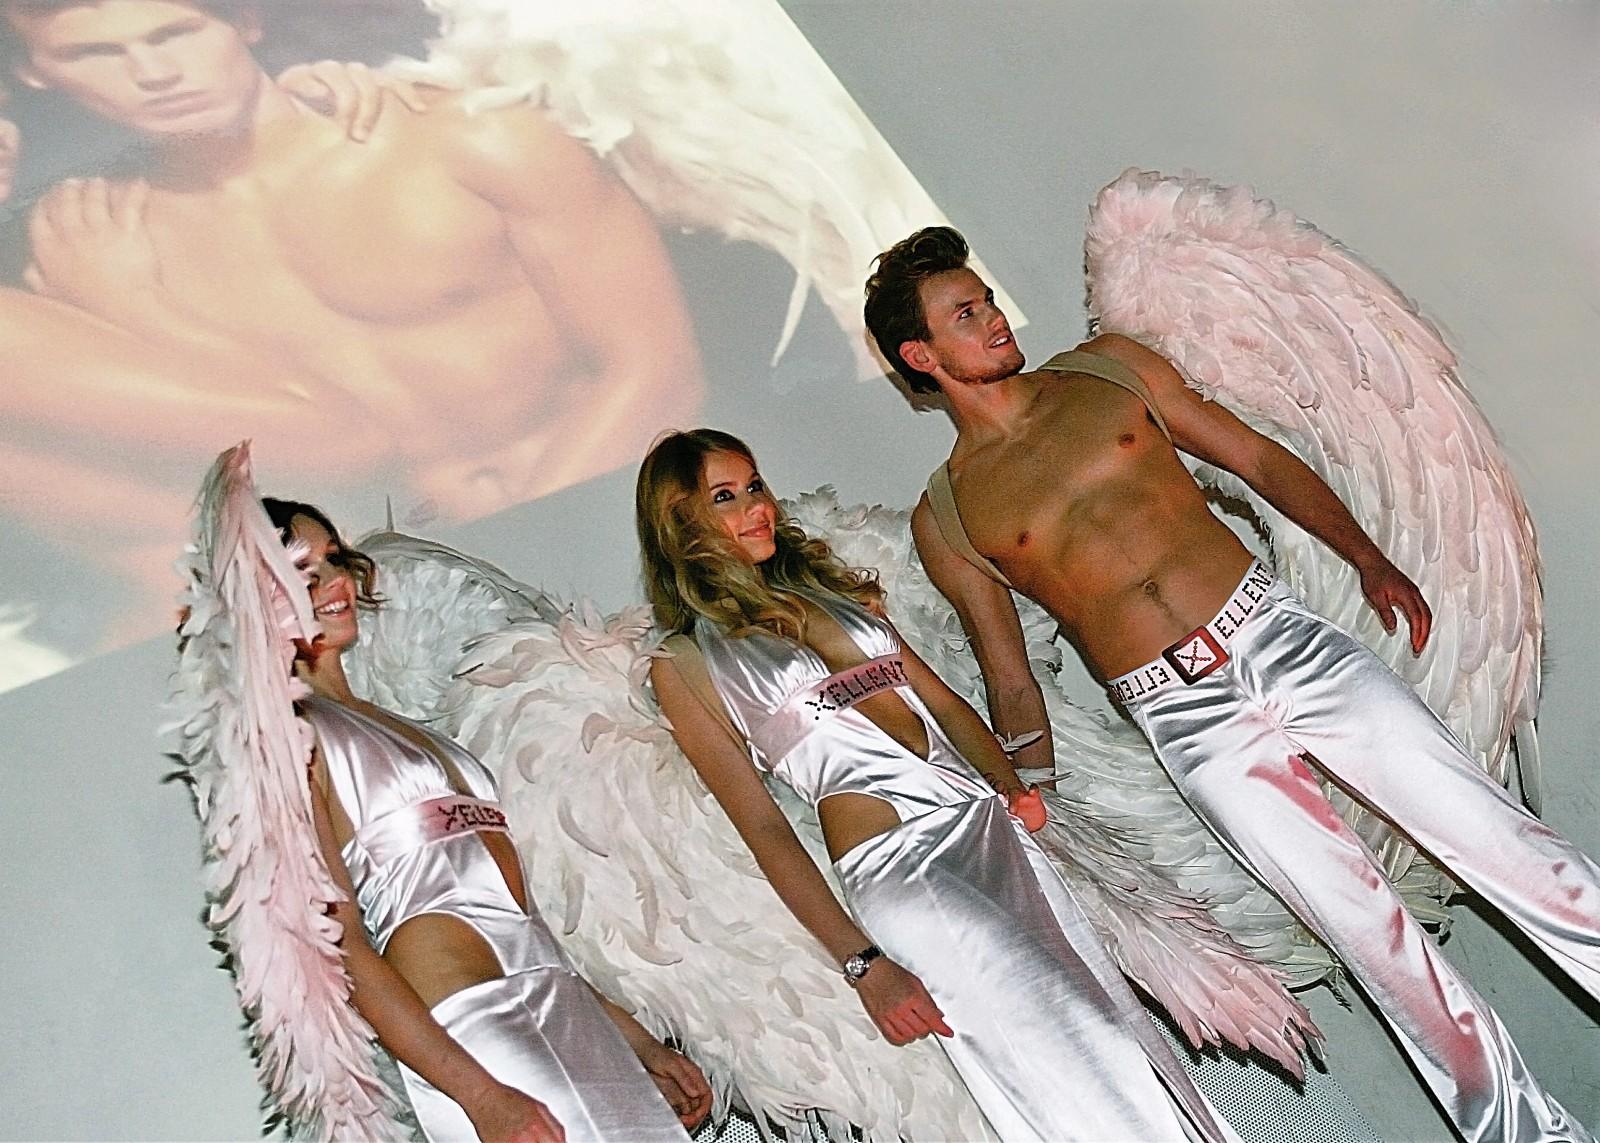 06_The Xellent Angels_zugeschnitten